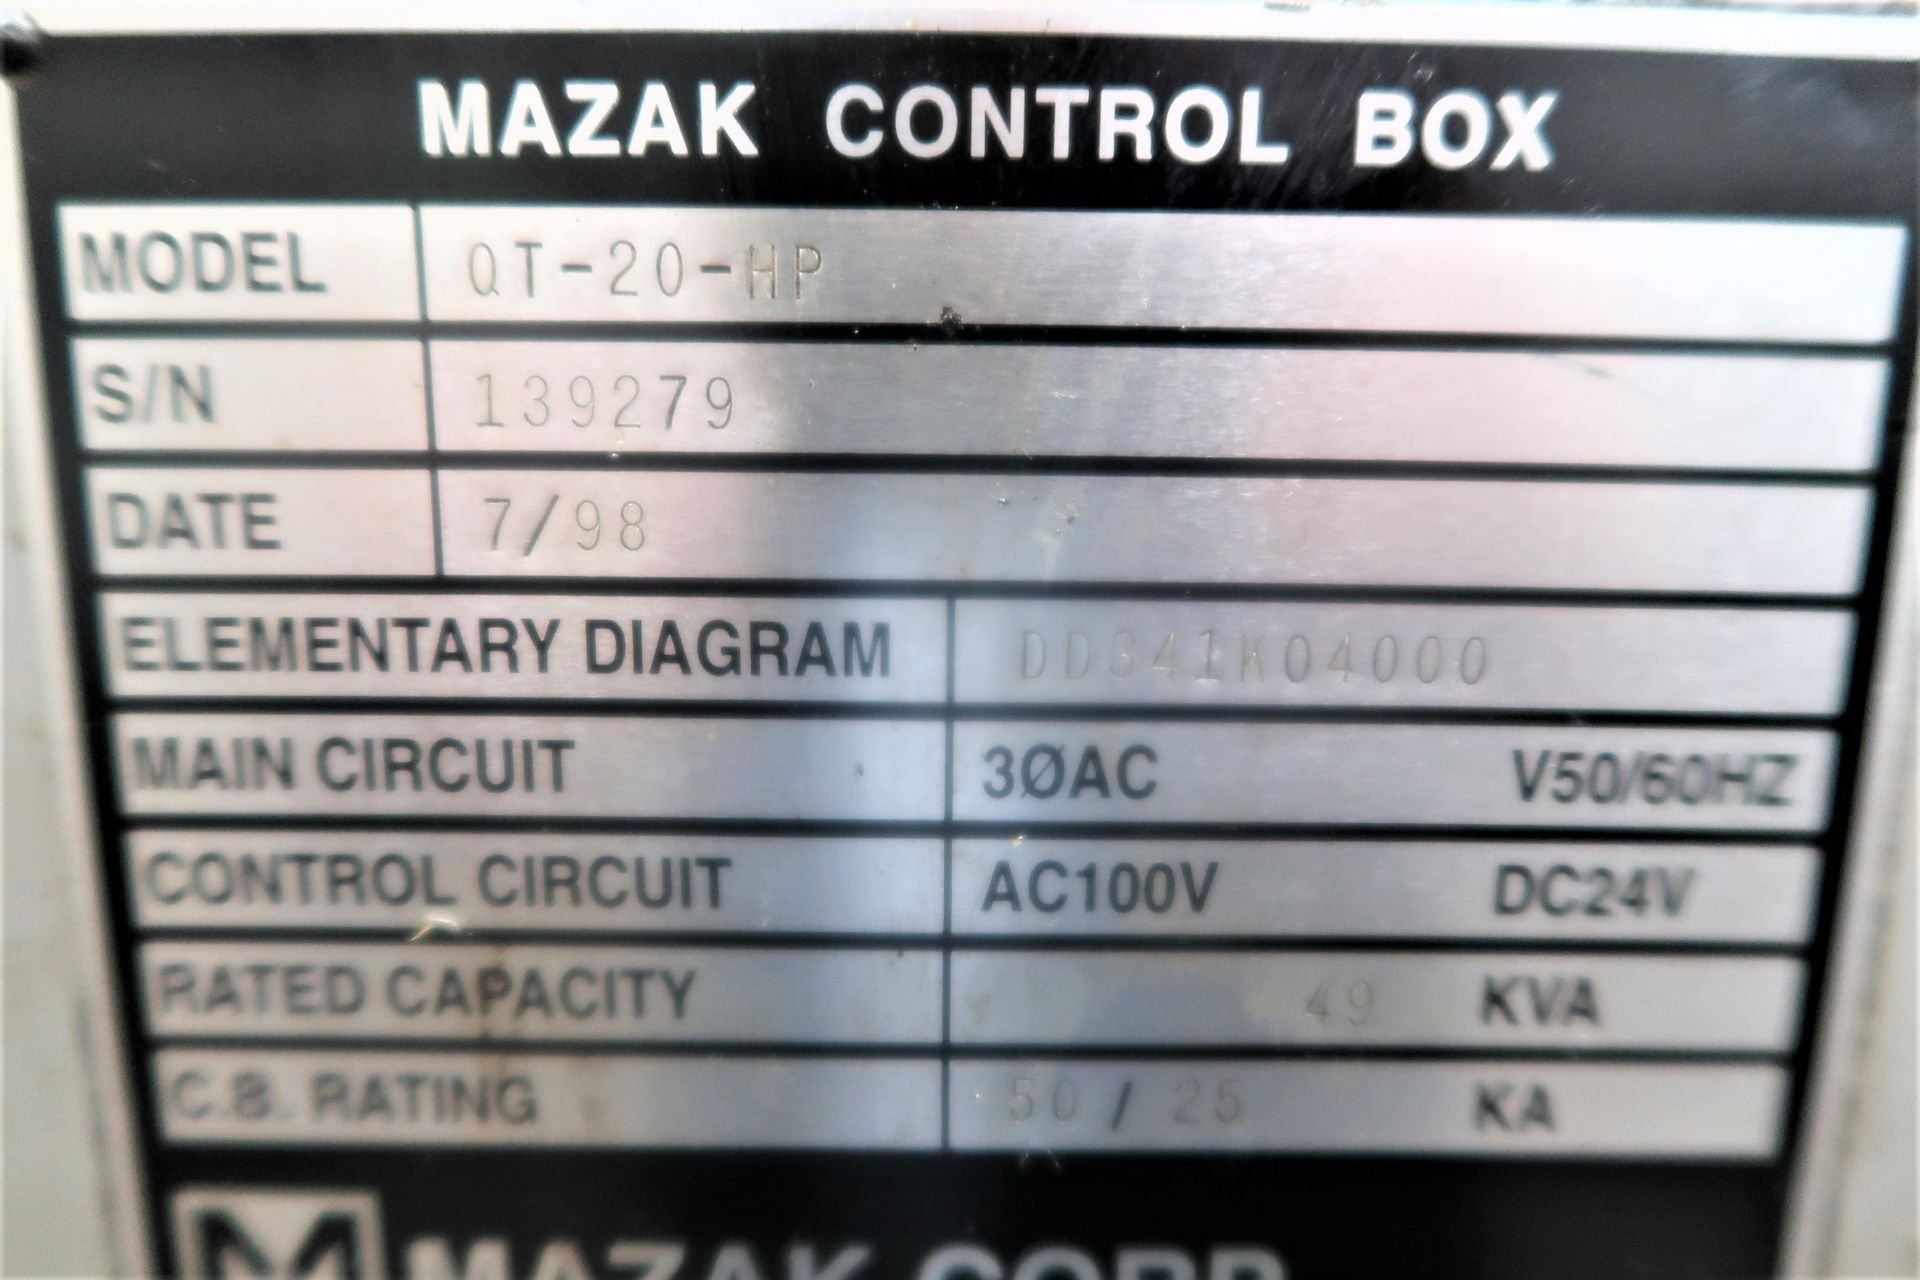 Lot 10A - MAZAK QT-20-HP CNC 2-AXIS TURNING CENTER LATHE